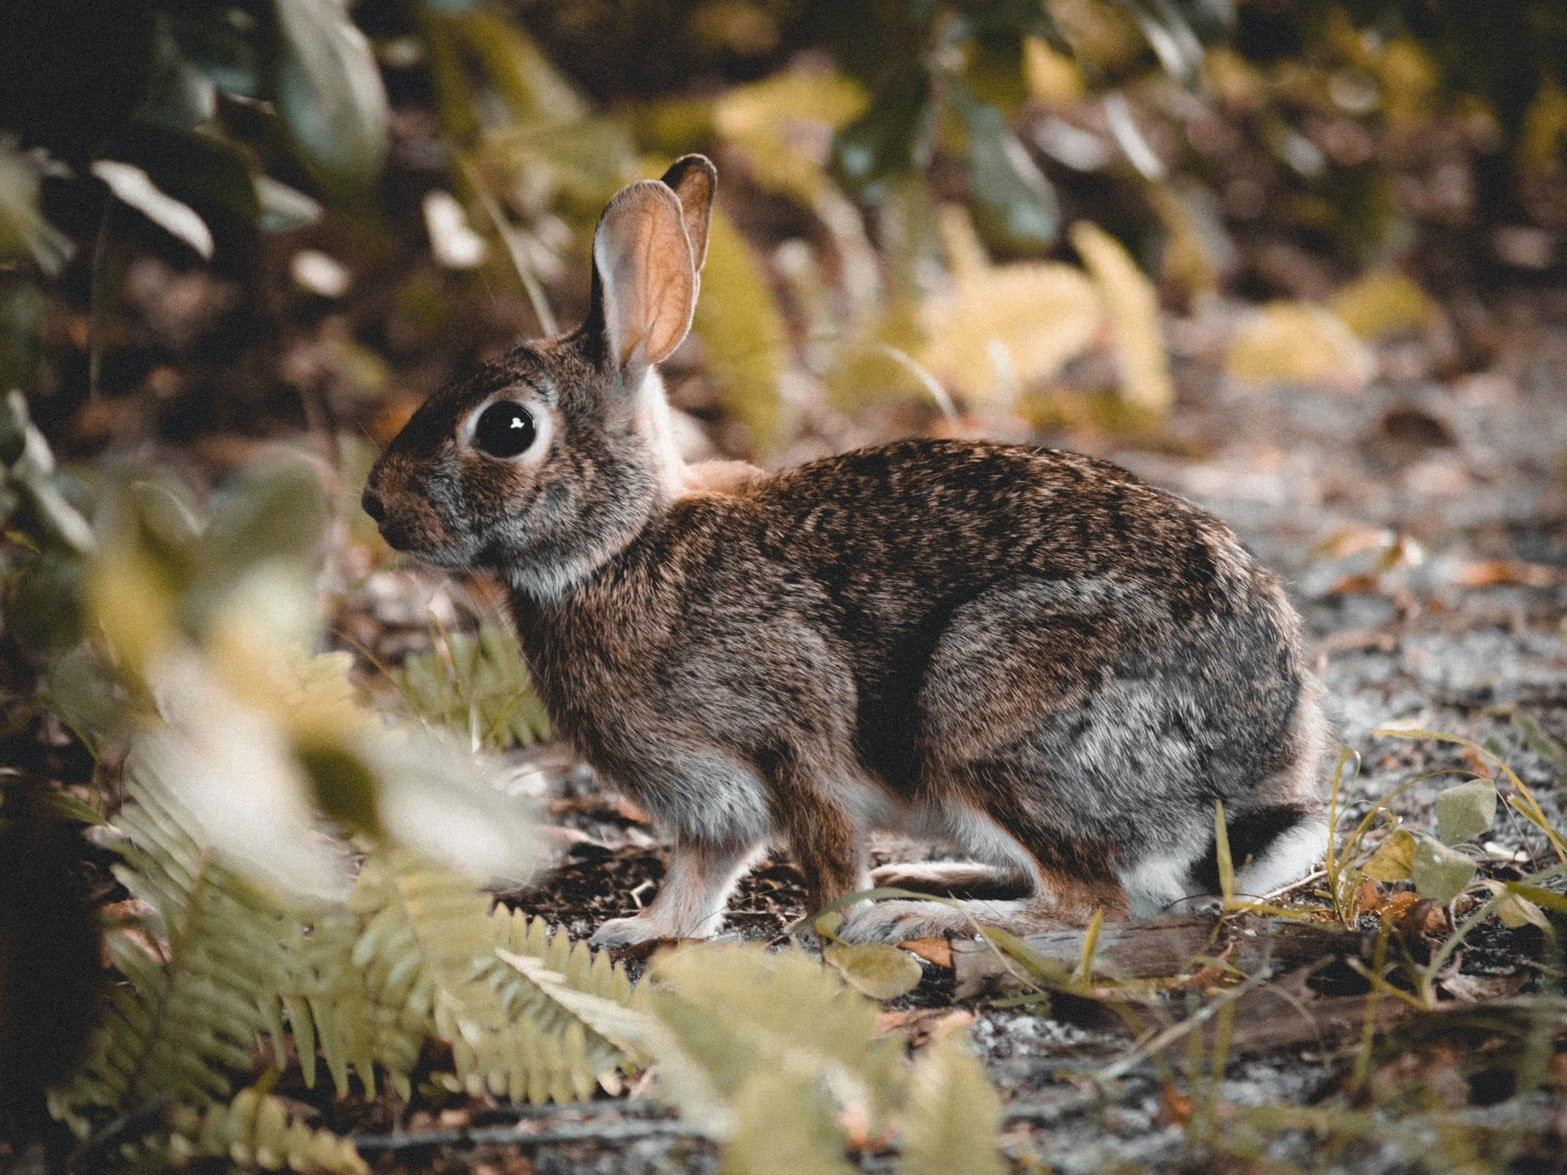 Can Rabbits Eat Dragon Fruit